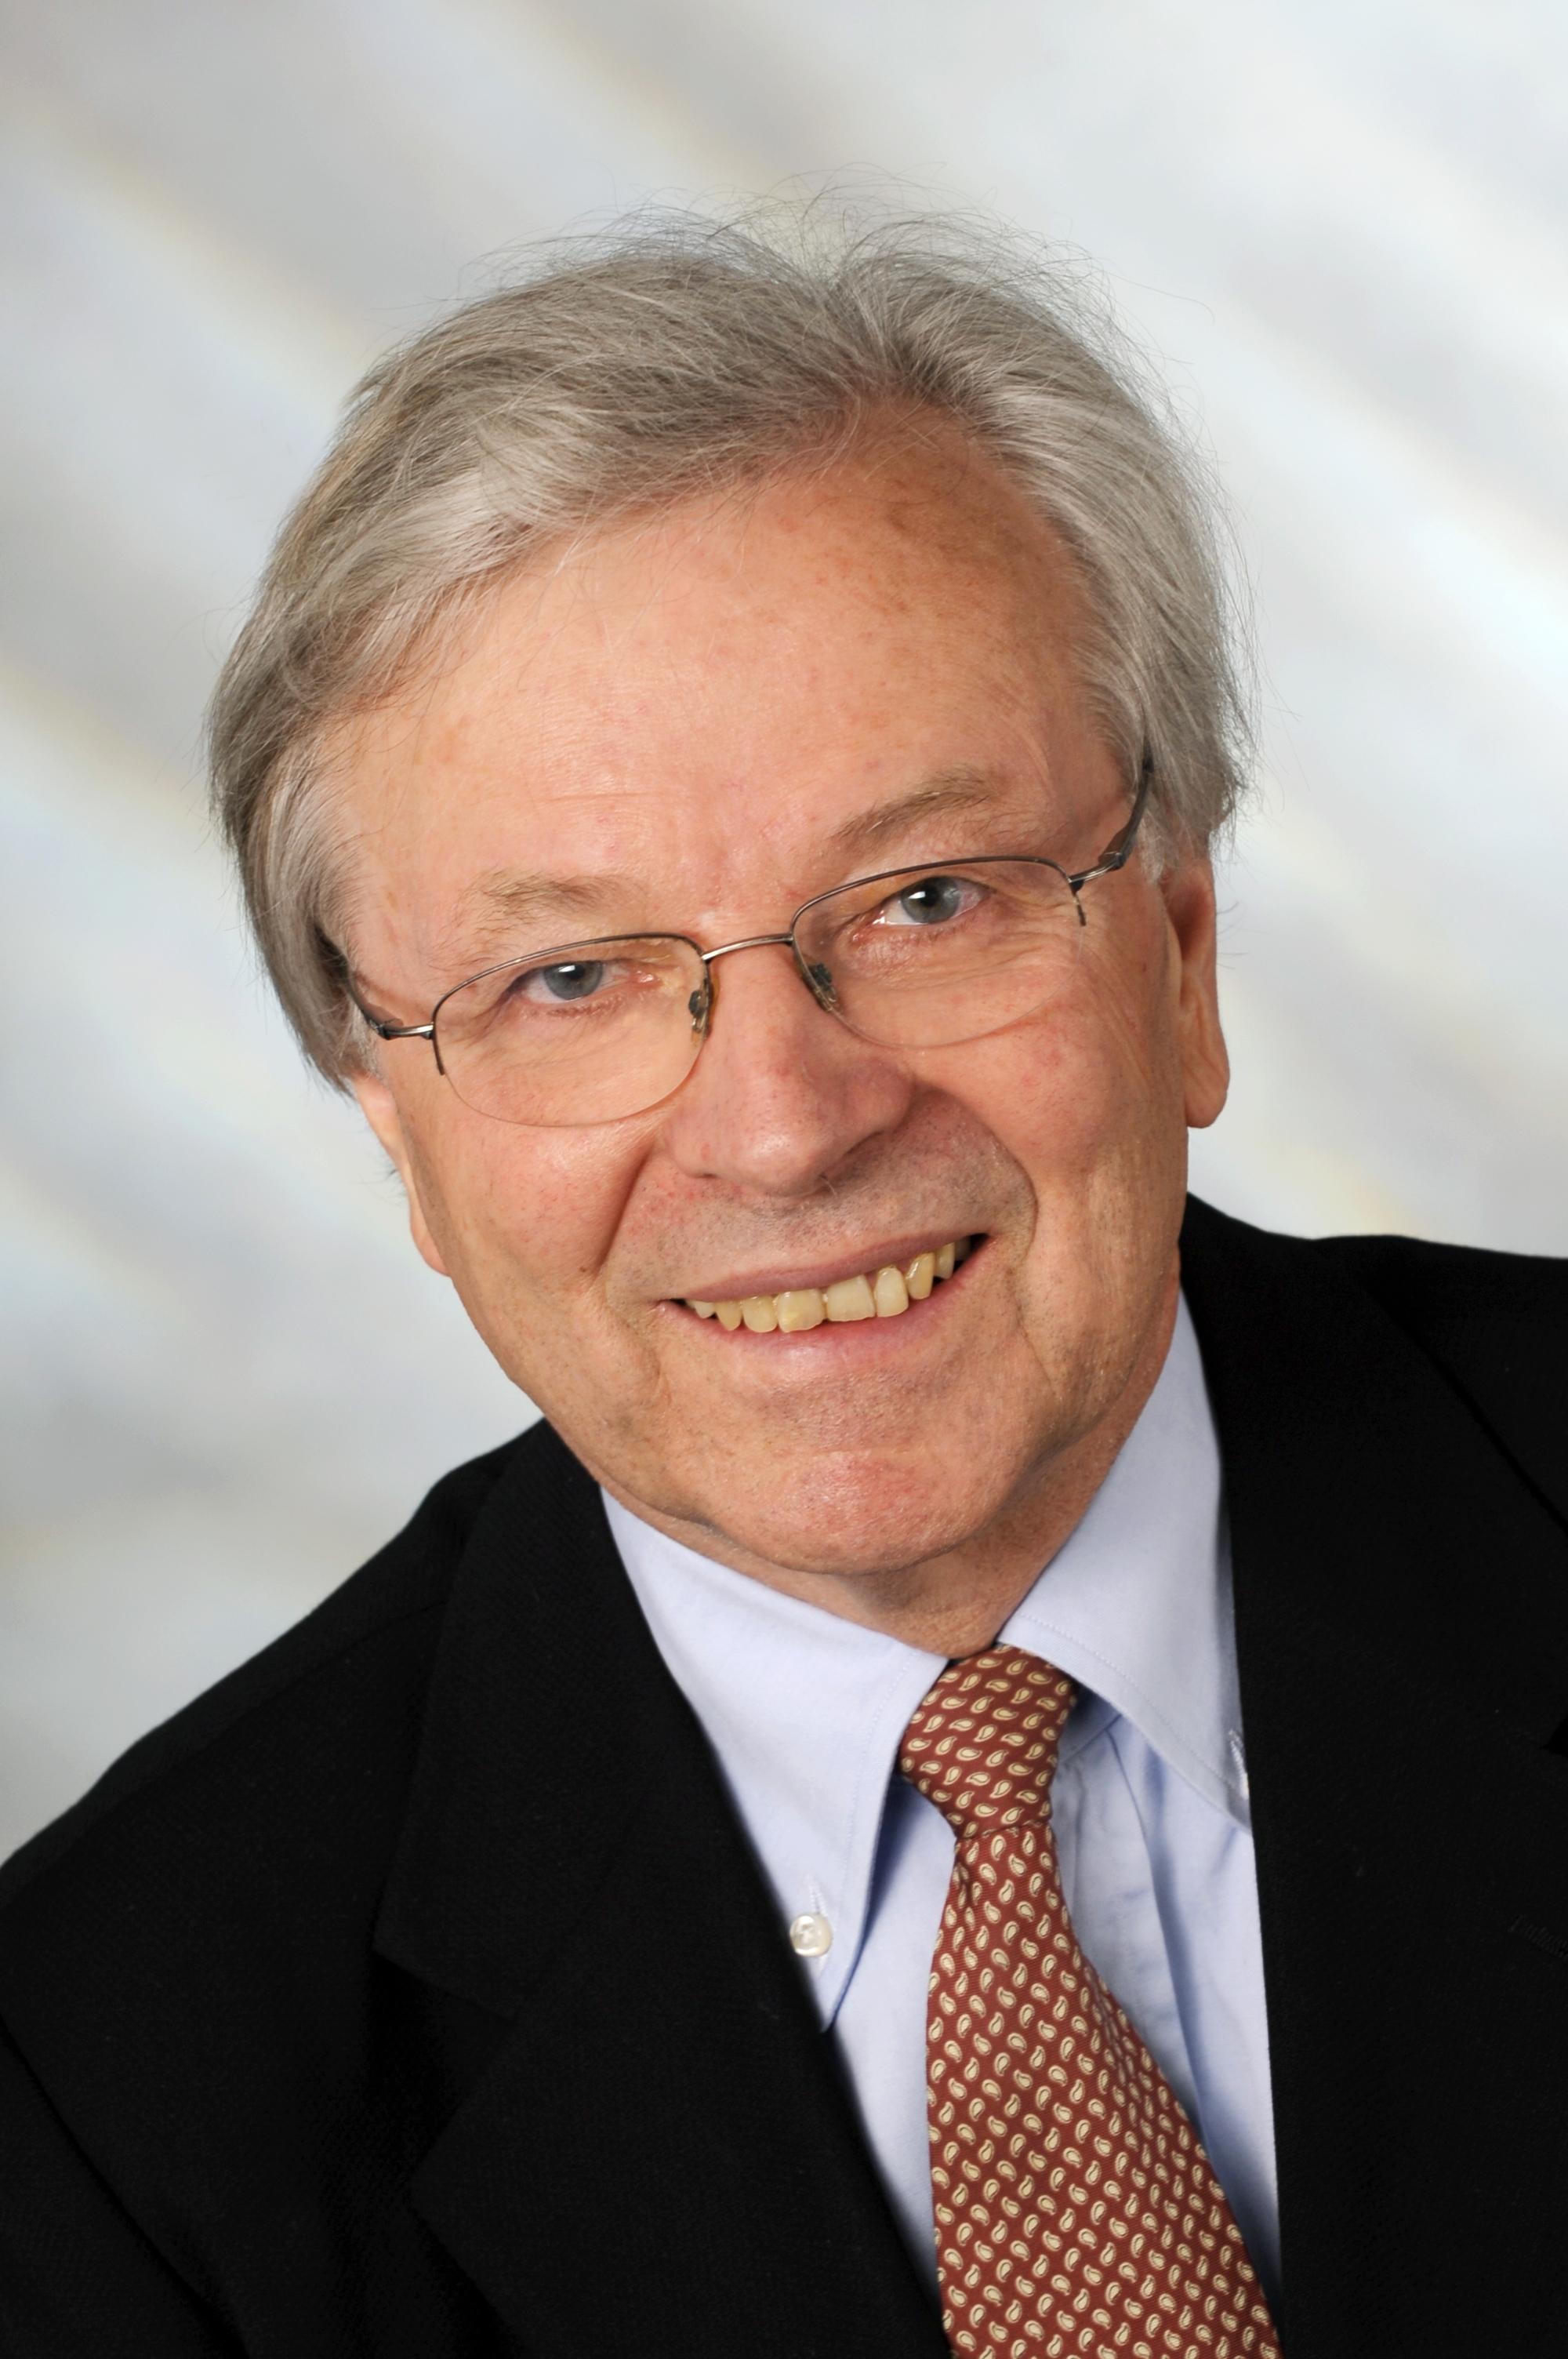 Rolf Buttkus